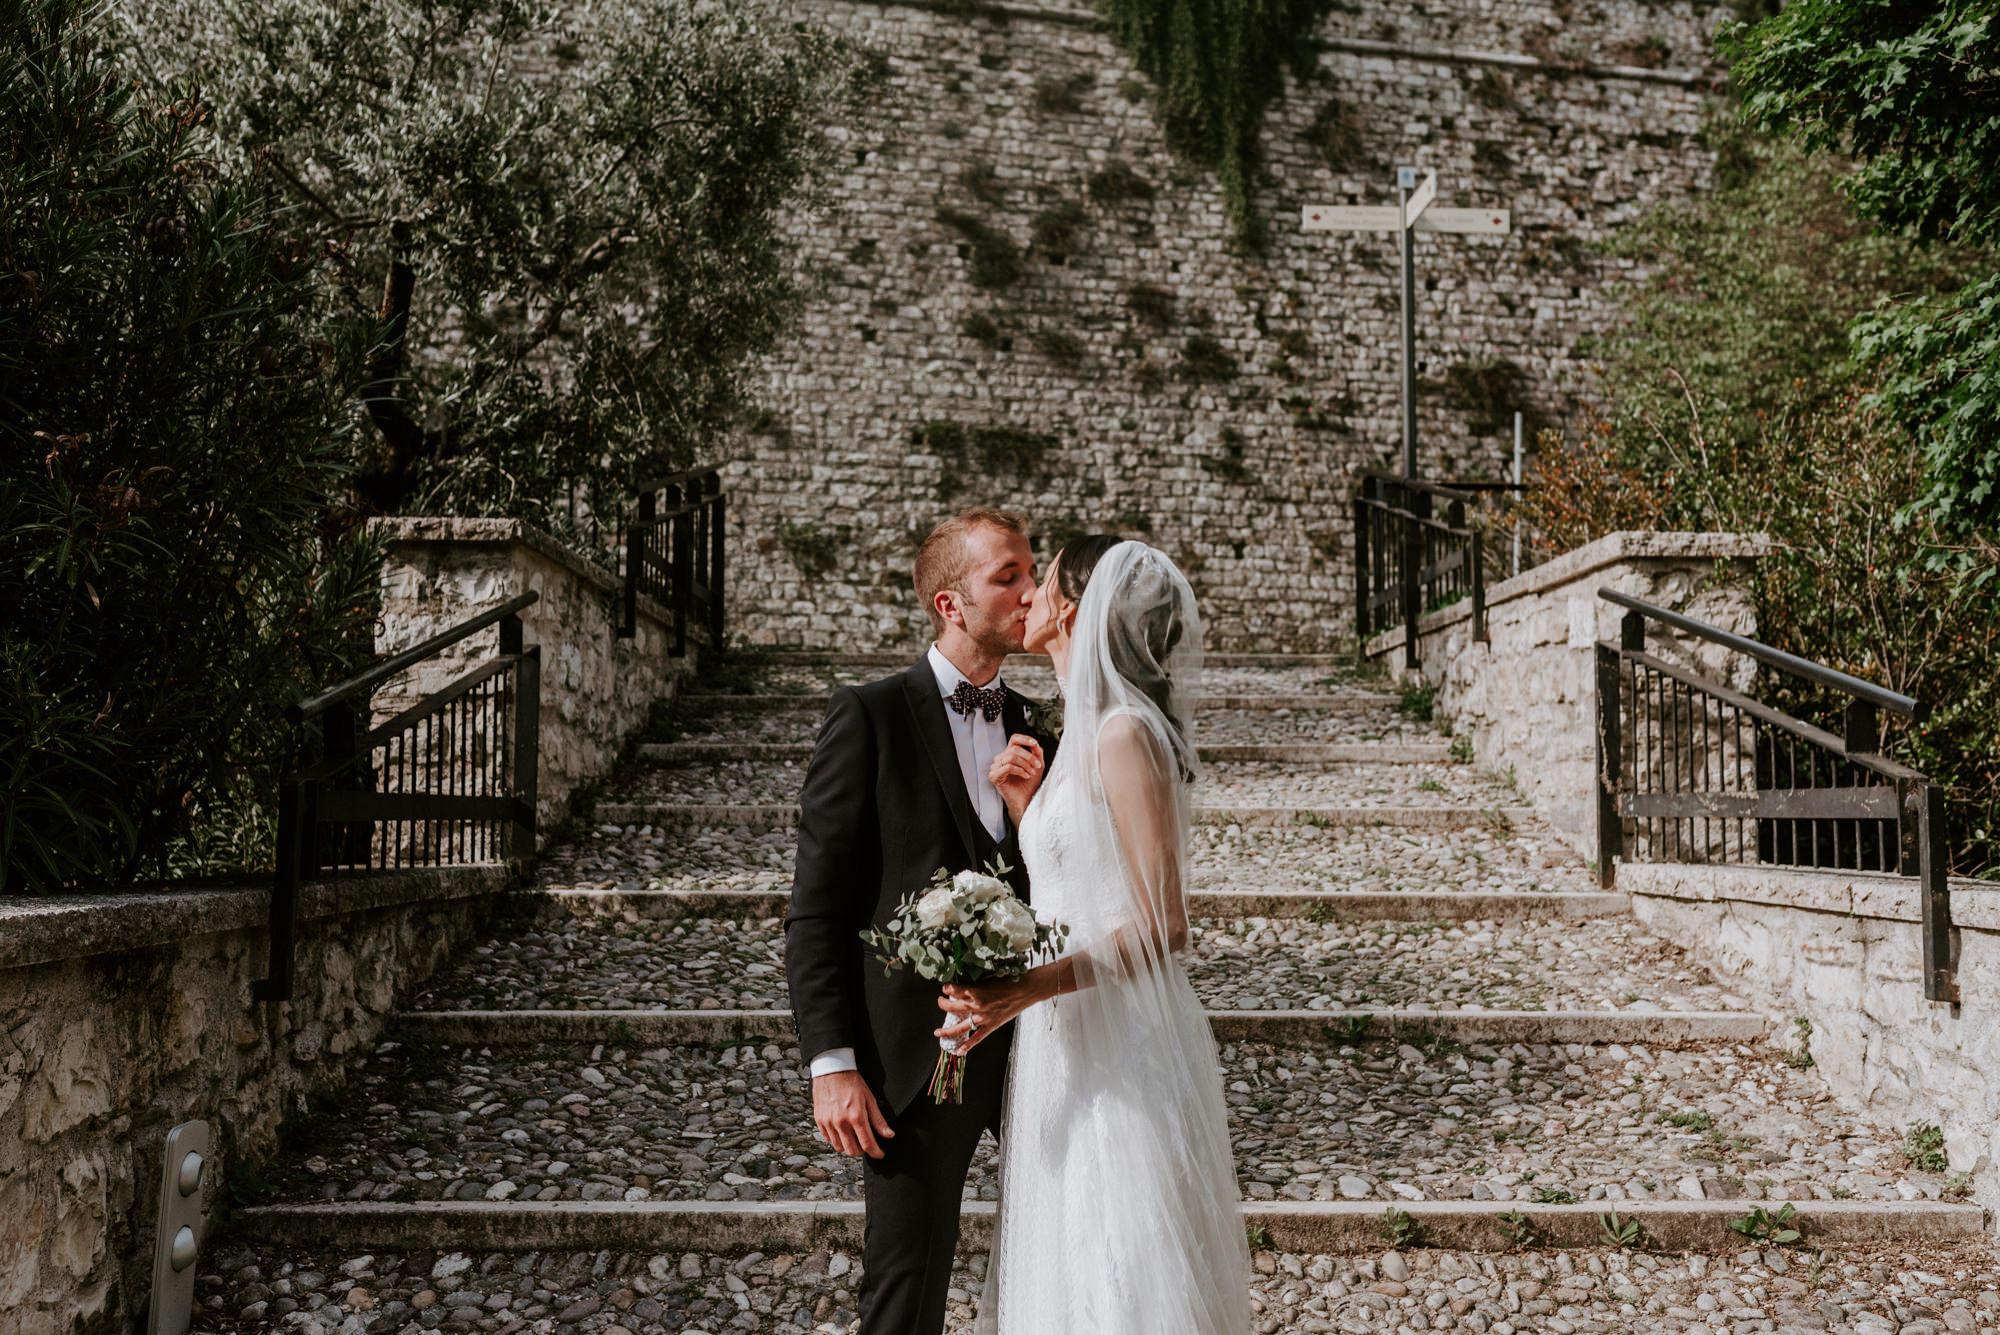 FOTO+PHOTO+BODA+WEDDING+ITALIA+ITALY+MAURICIO+GARAY+MAURICIOGARAY+WEDDINPHOTOGRAPHER+FOTOGRAFODEBODA-1230.jpg